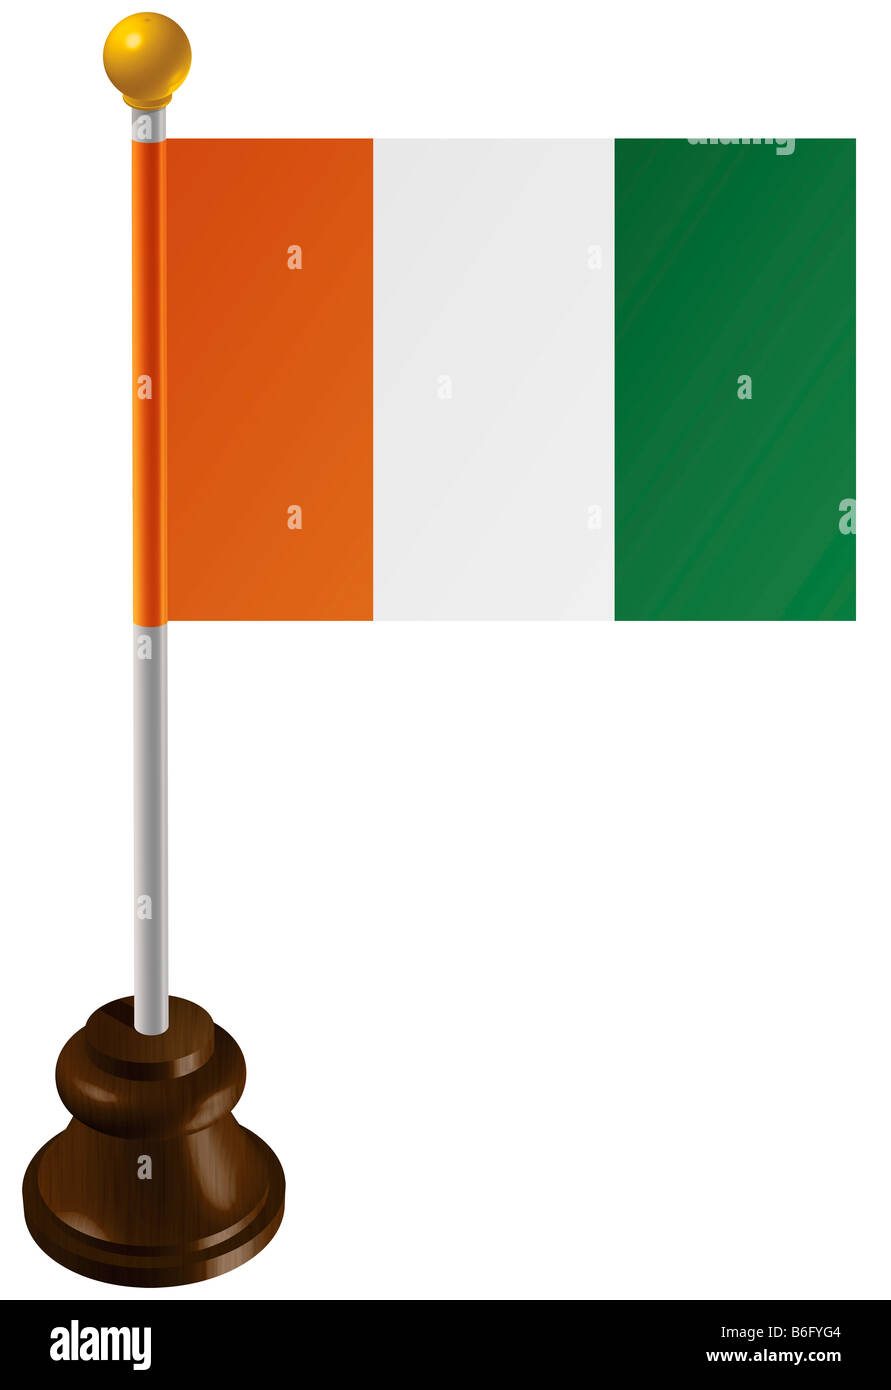 Cote d'Ivoire flag as a marker - Stock Image